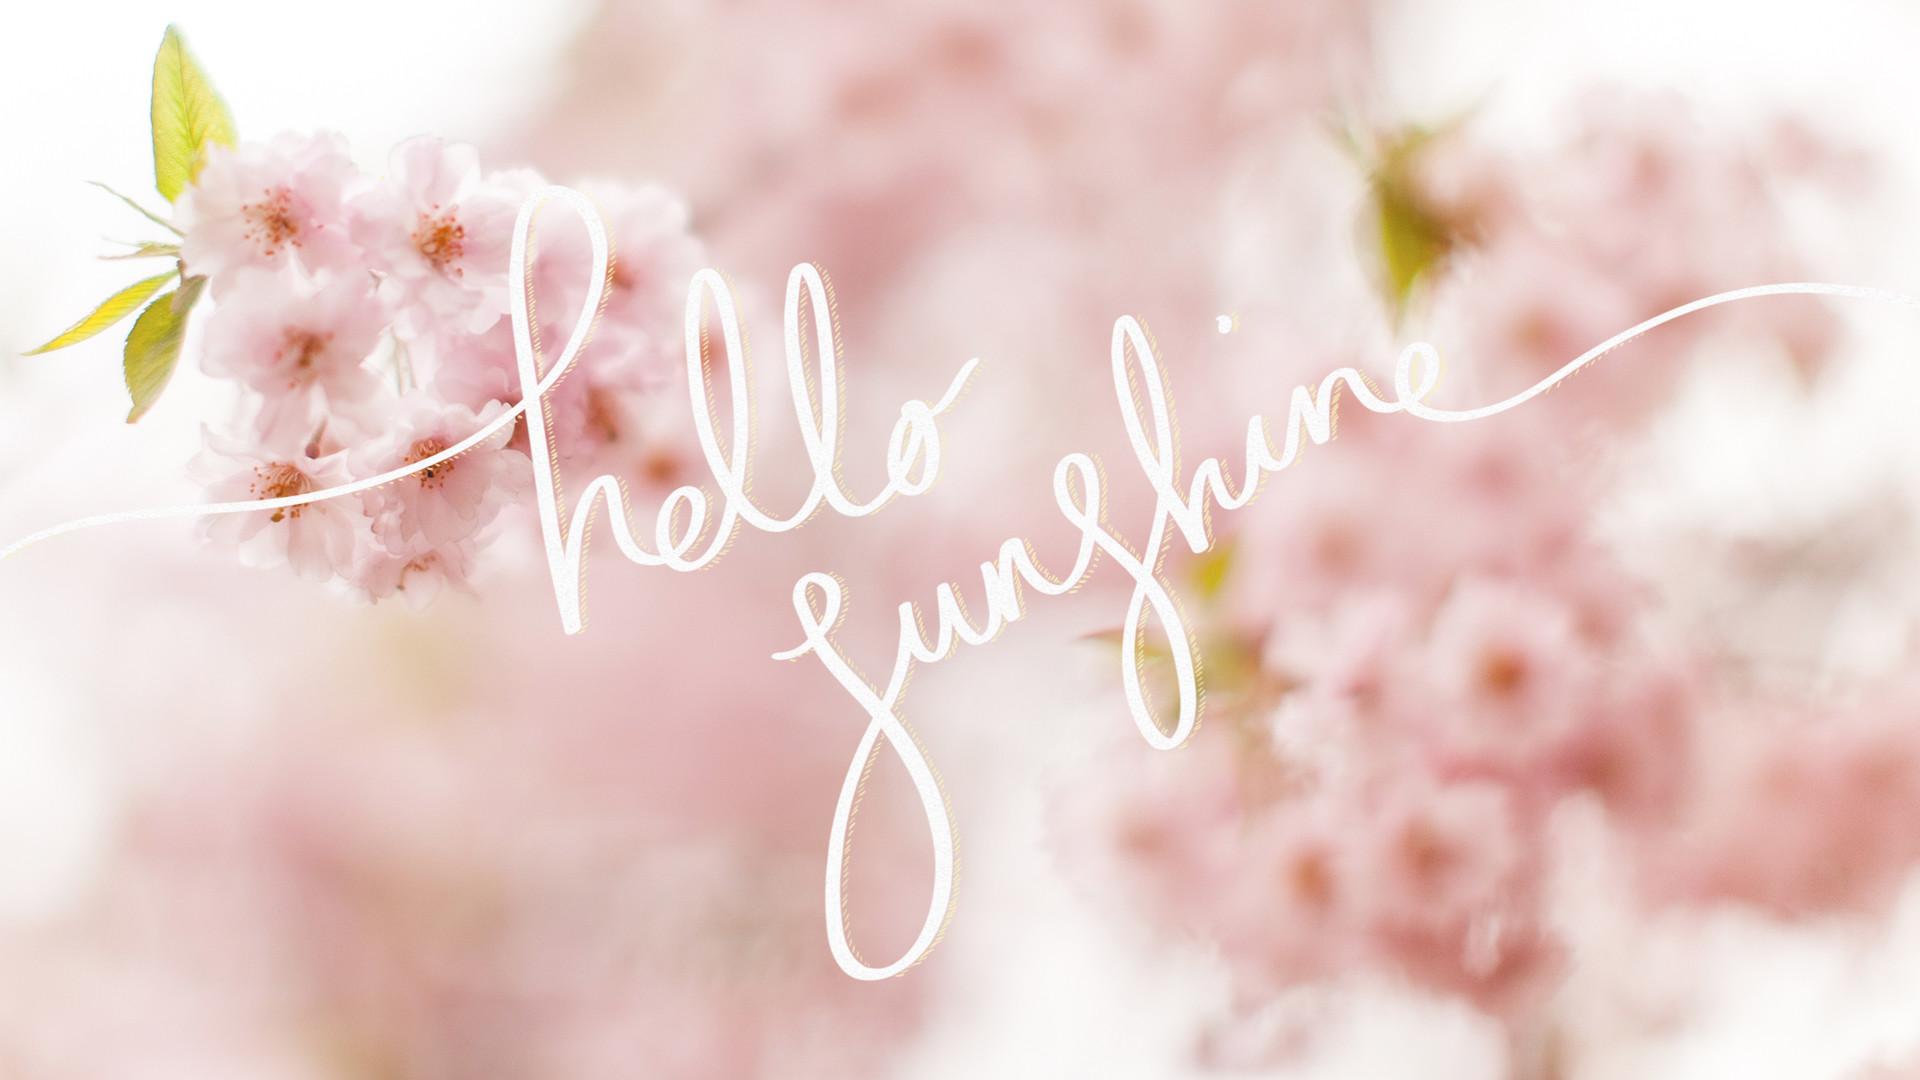 16978556848_e27333d4c4_o.jpg 1,920×1,080 pixels   Desktop Wallpaper    Pinterest   Hello sunshine and Wallpaper